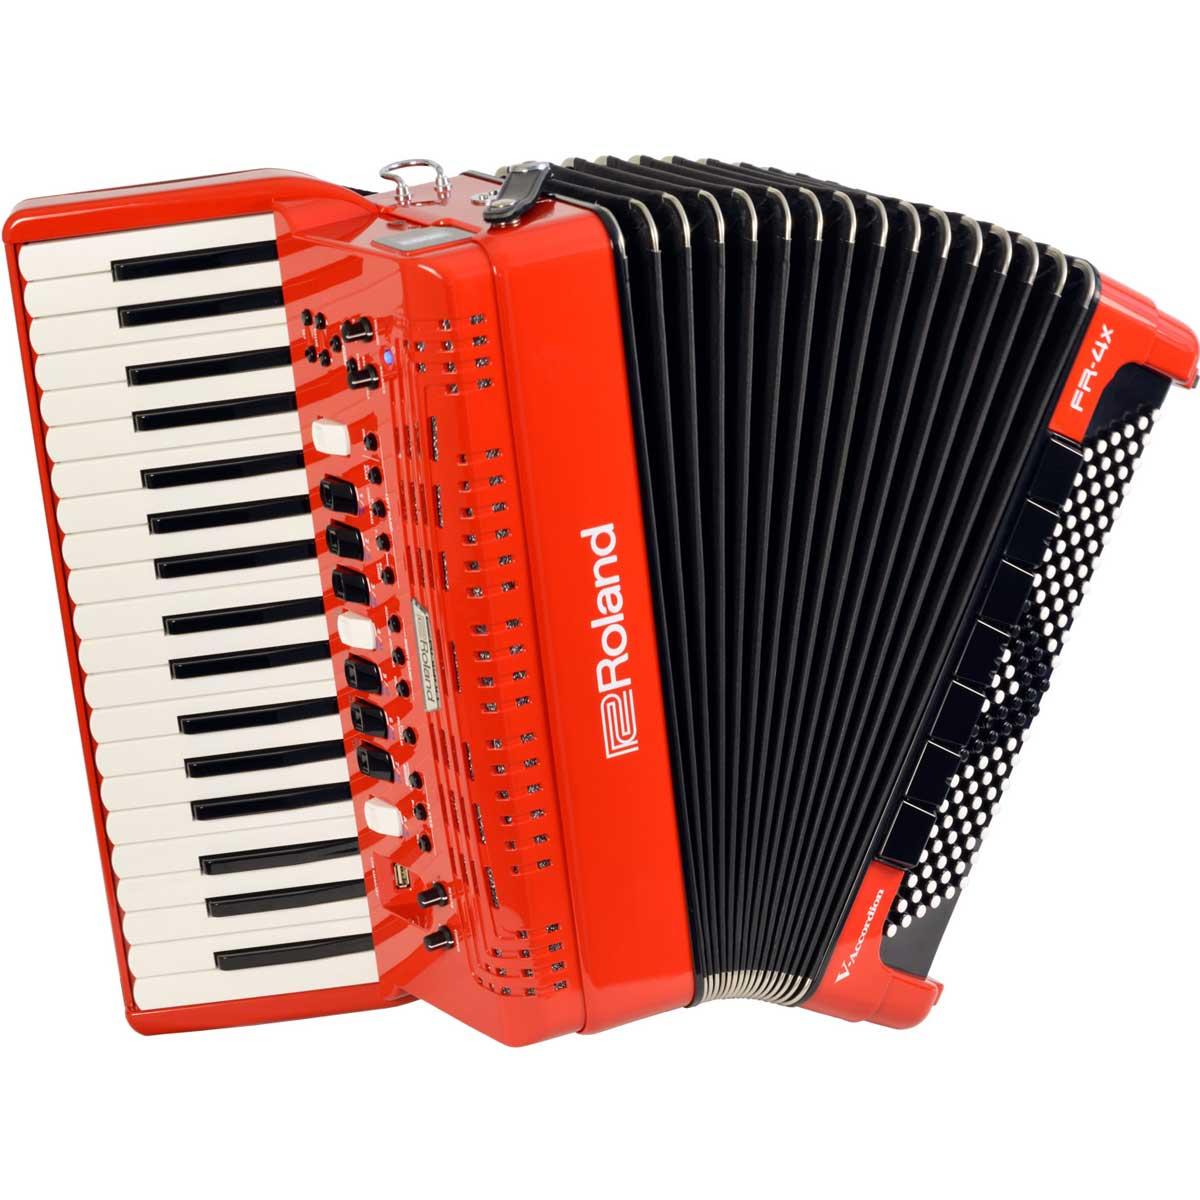 Roland ローランド / V-Accordion FR-4X RD レッド Vアコーディオン ピアノ鍵盤タイプ【お取り寄せ商品】《納期別途ご案内》【YRK】